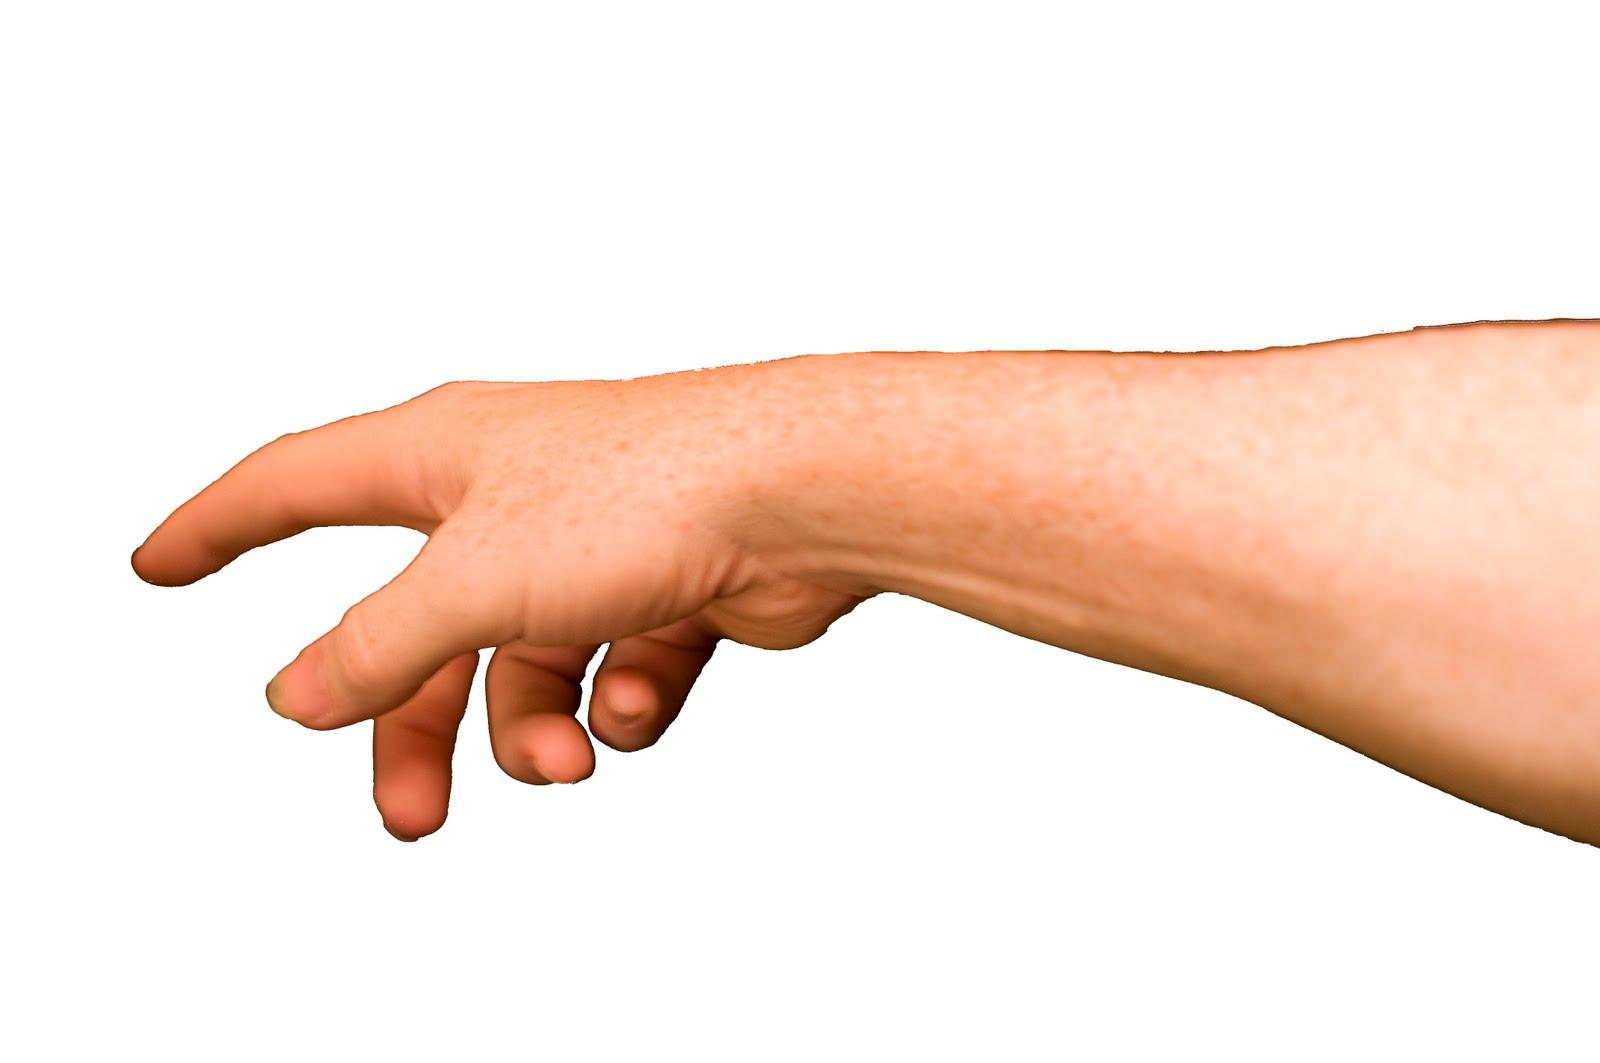 Arm pointing arrow clipart vector free download Free Arm Pointing Png, Download Free Clip Art, Free Clip Art on ... vector free download